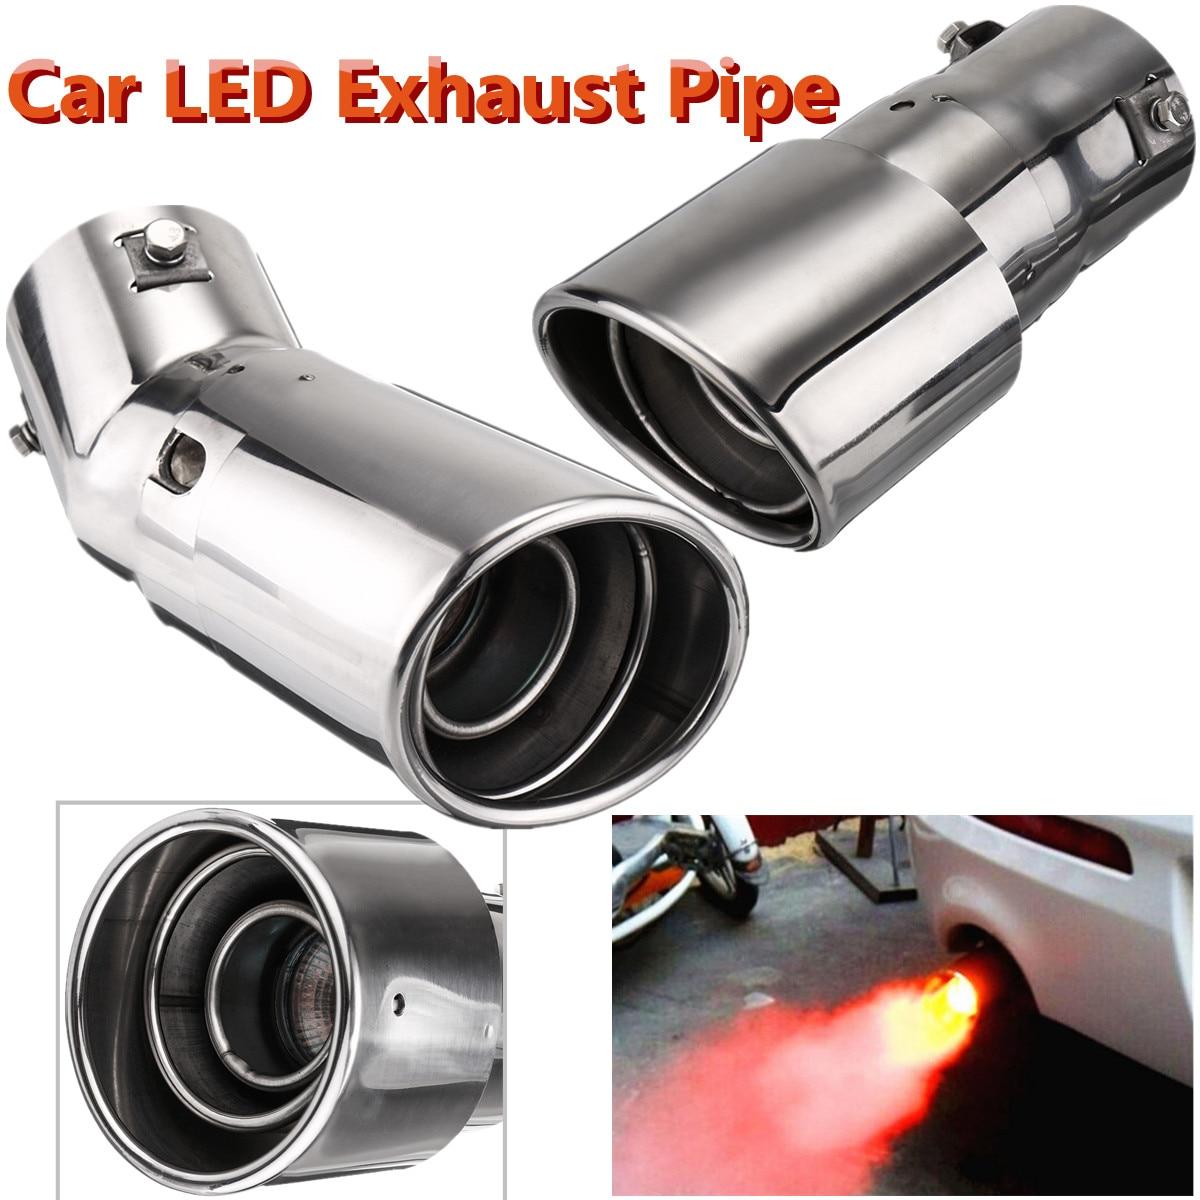 63mm Inlet Blue LED Steel+Carbon Exhaust Tip Car Muffler Pipe Decoration Light